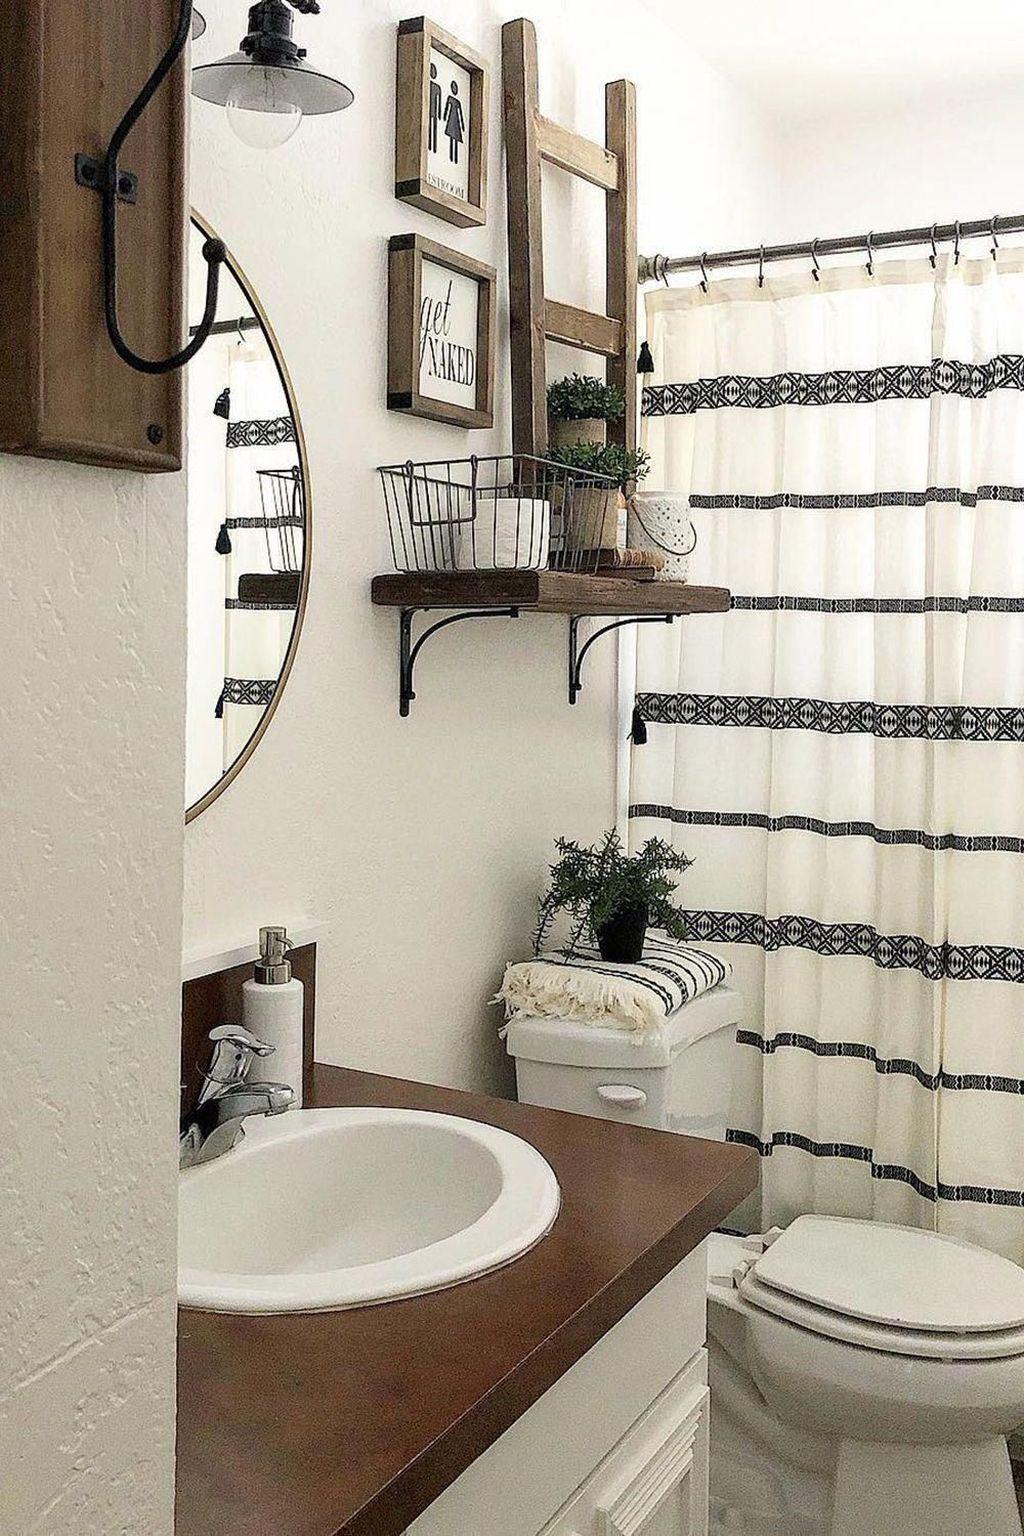 Fascinating Rustic Bathroom Decor Ideas You Must Copy 32